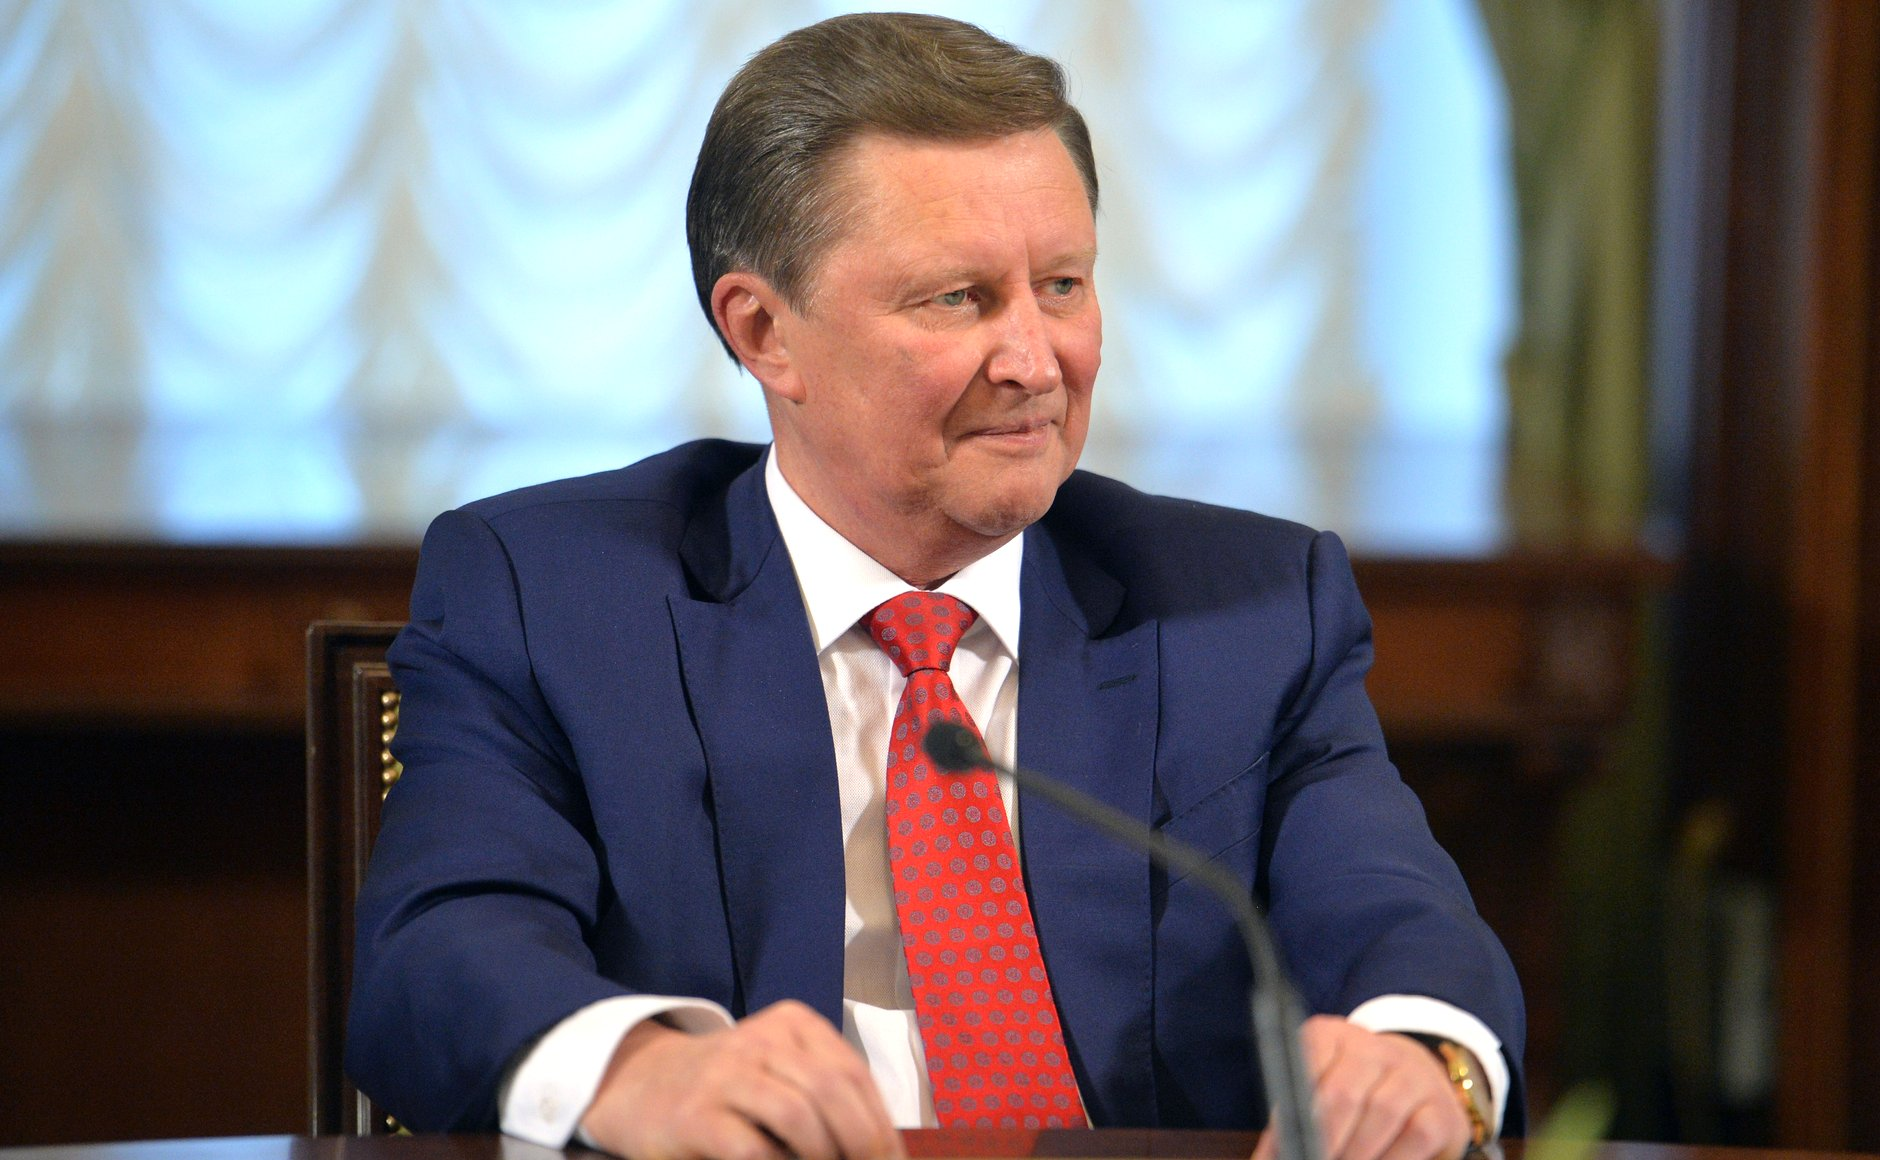 На заседании Совета при Президенте по противодействию коррупции Иванов доложил главе государства,